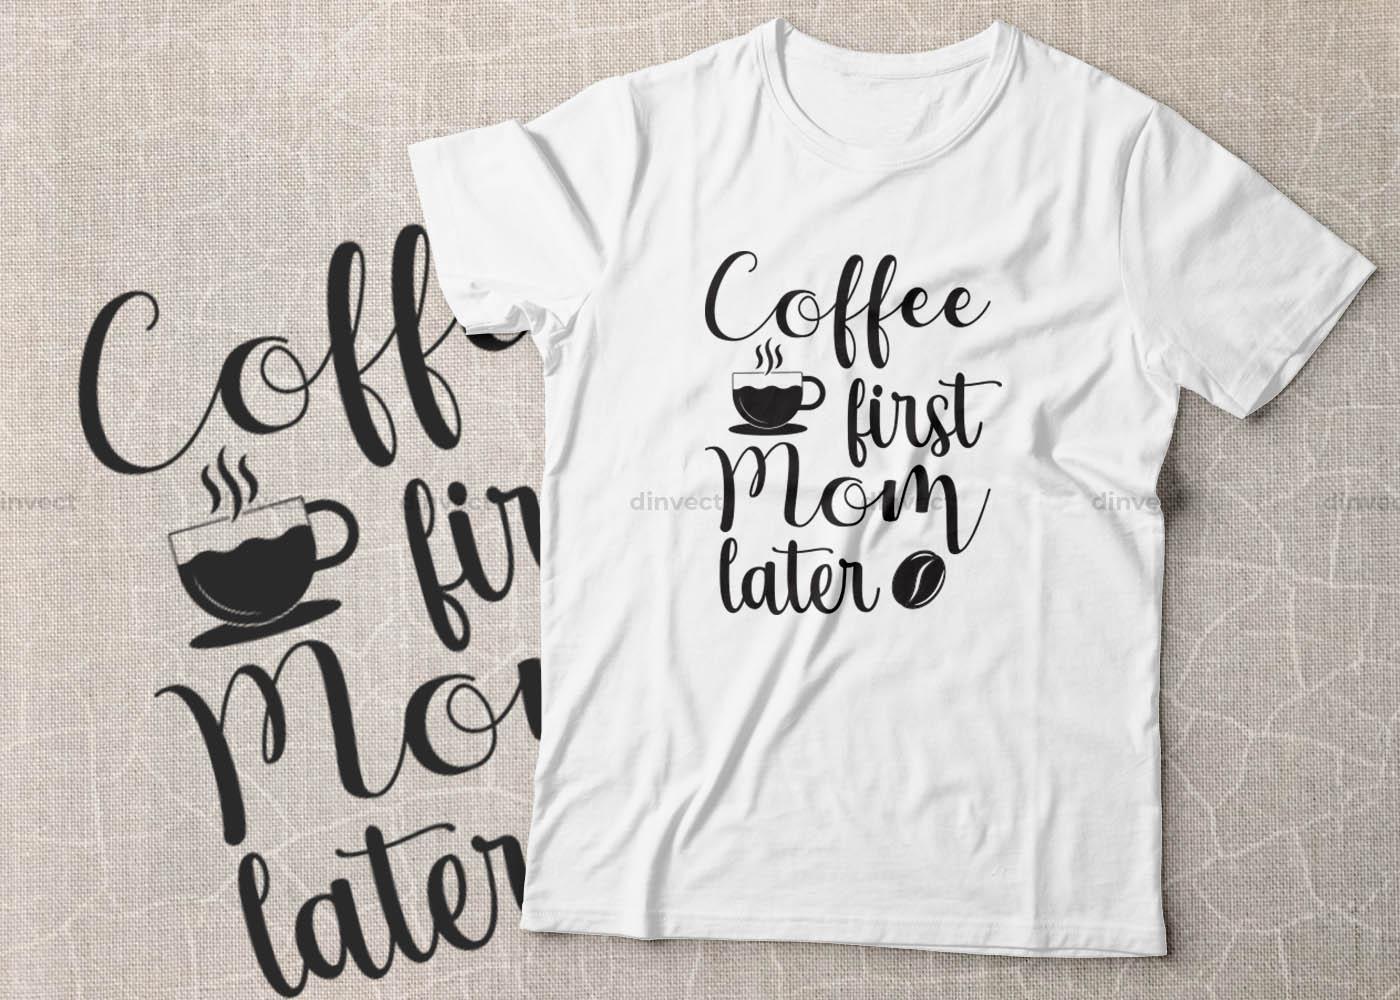 Coffee SVG, Coffee Bundle Svg, Coffee Mug Svg, Funny Coffee Quotes SVG, Mug Design Svg - School Design -